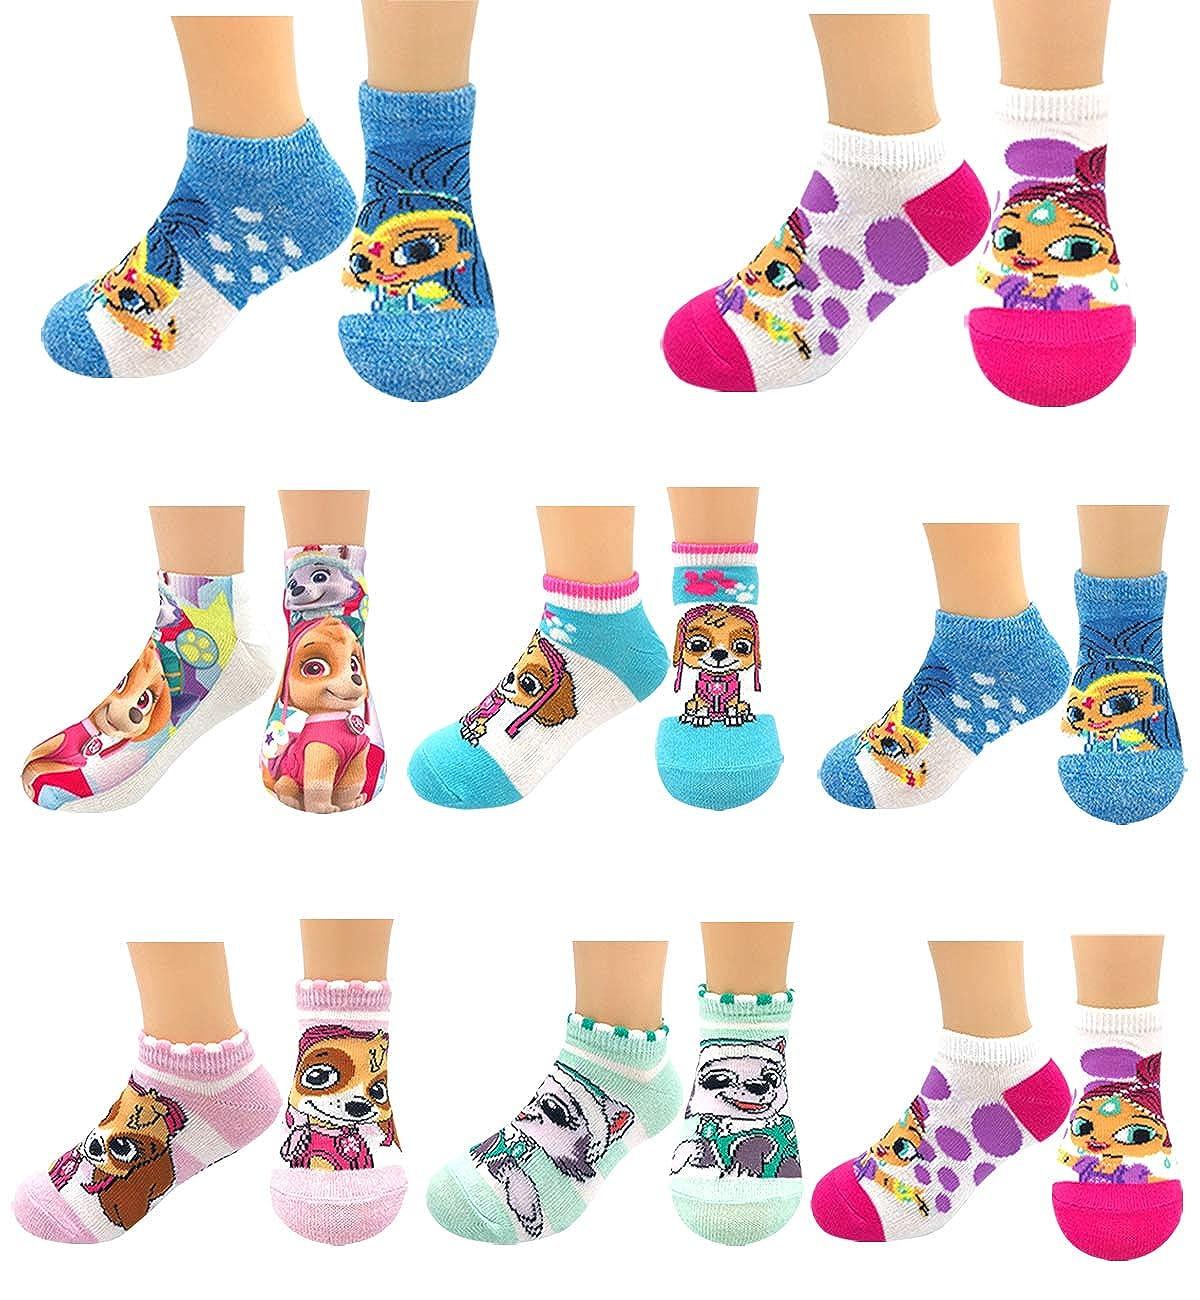 Kids Boys Girls Licensed Disney Marvel SuperHeroes Short Ankle Low Cut No Show Crew Neck Socks Set for Gifts Goodies